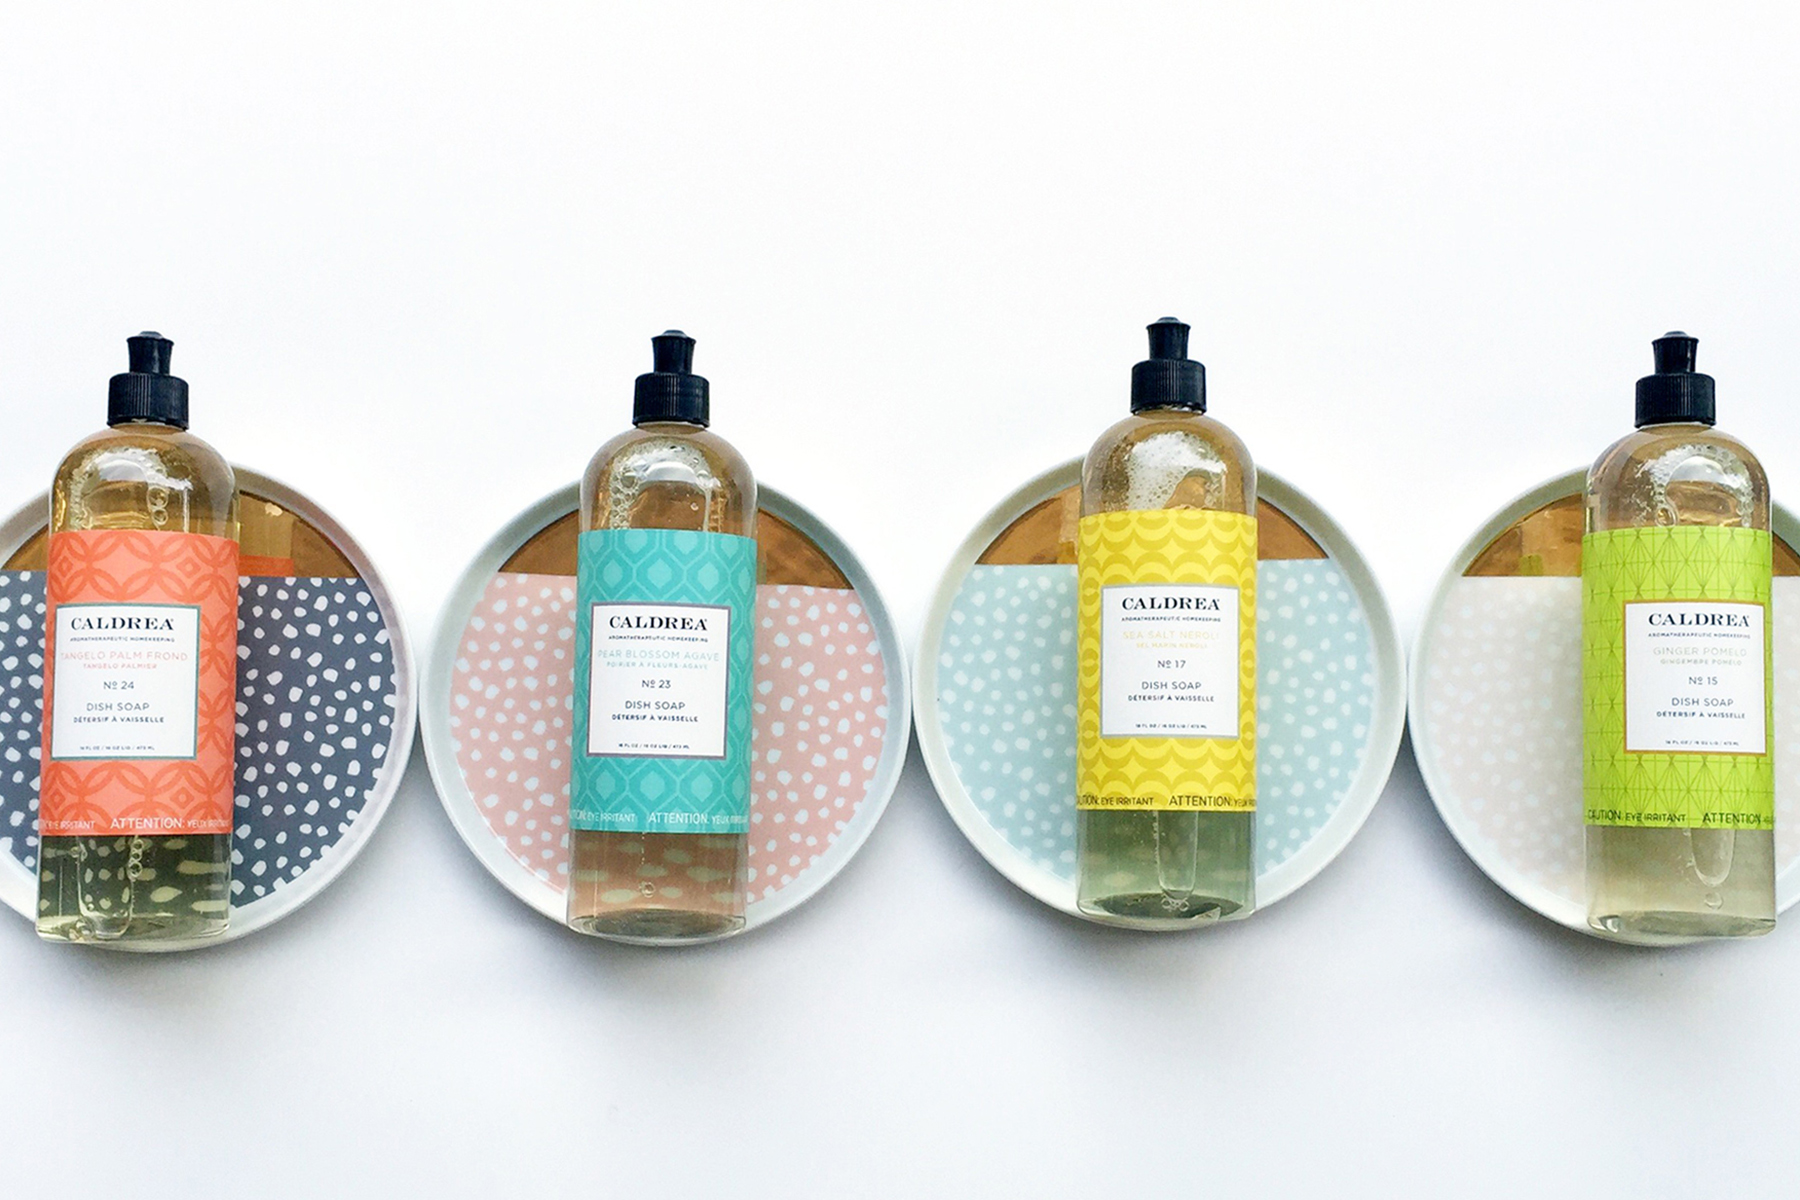 A Luxury Freebie for You: Caldrea Gift Set - The Mom Creative